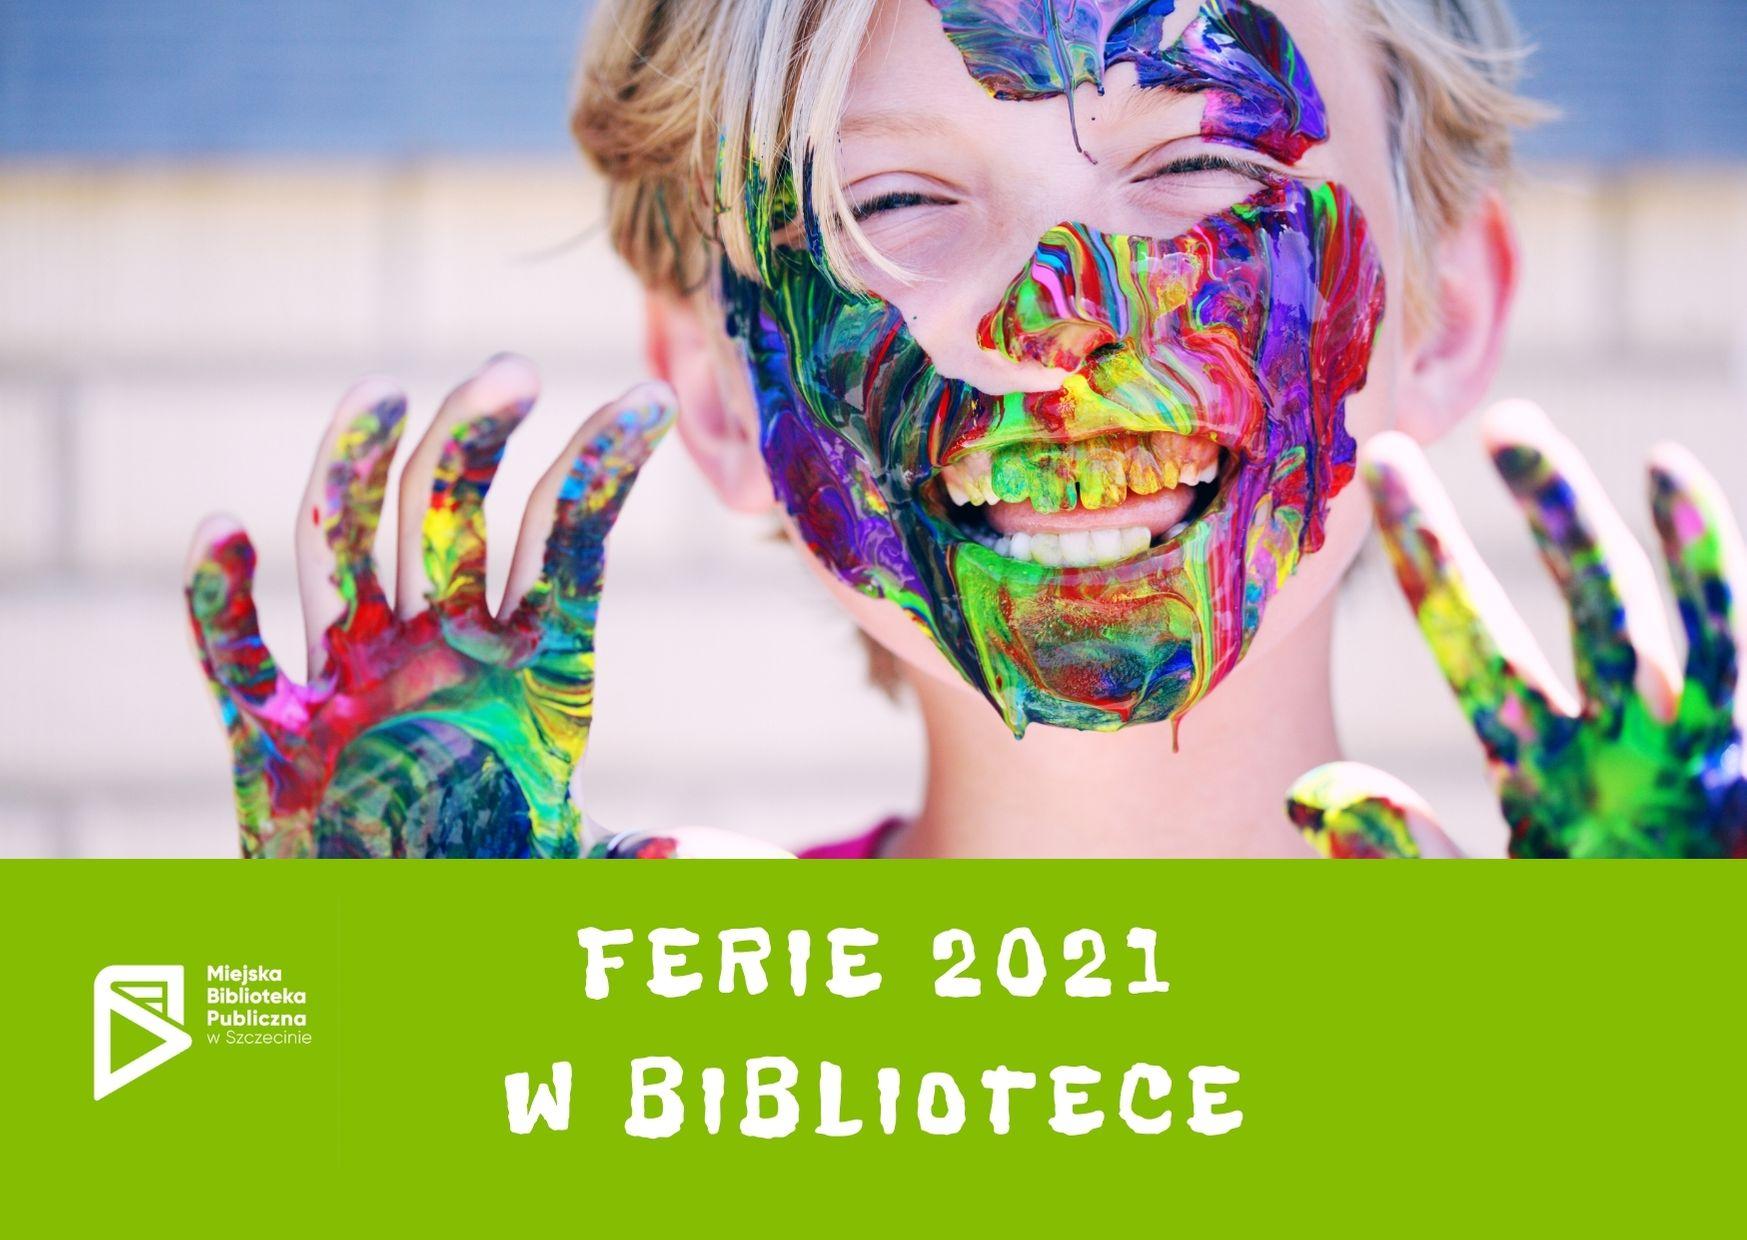 Ferie 2021 w bibliotece [online]